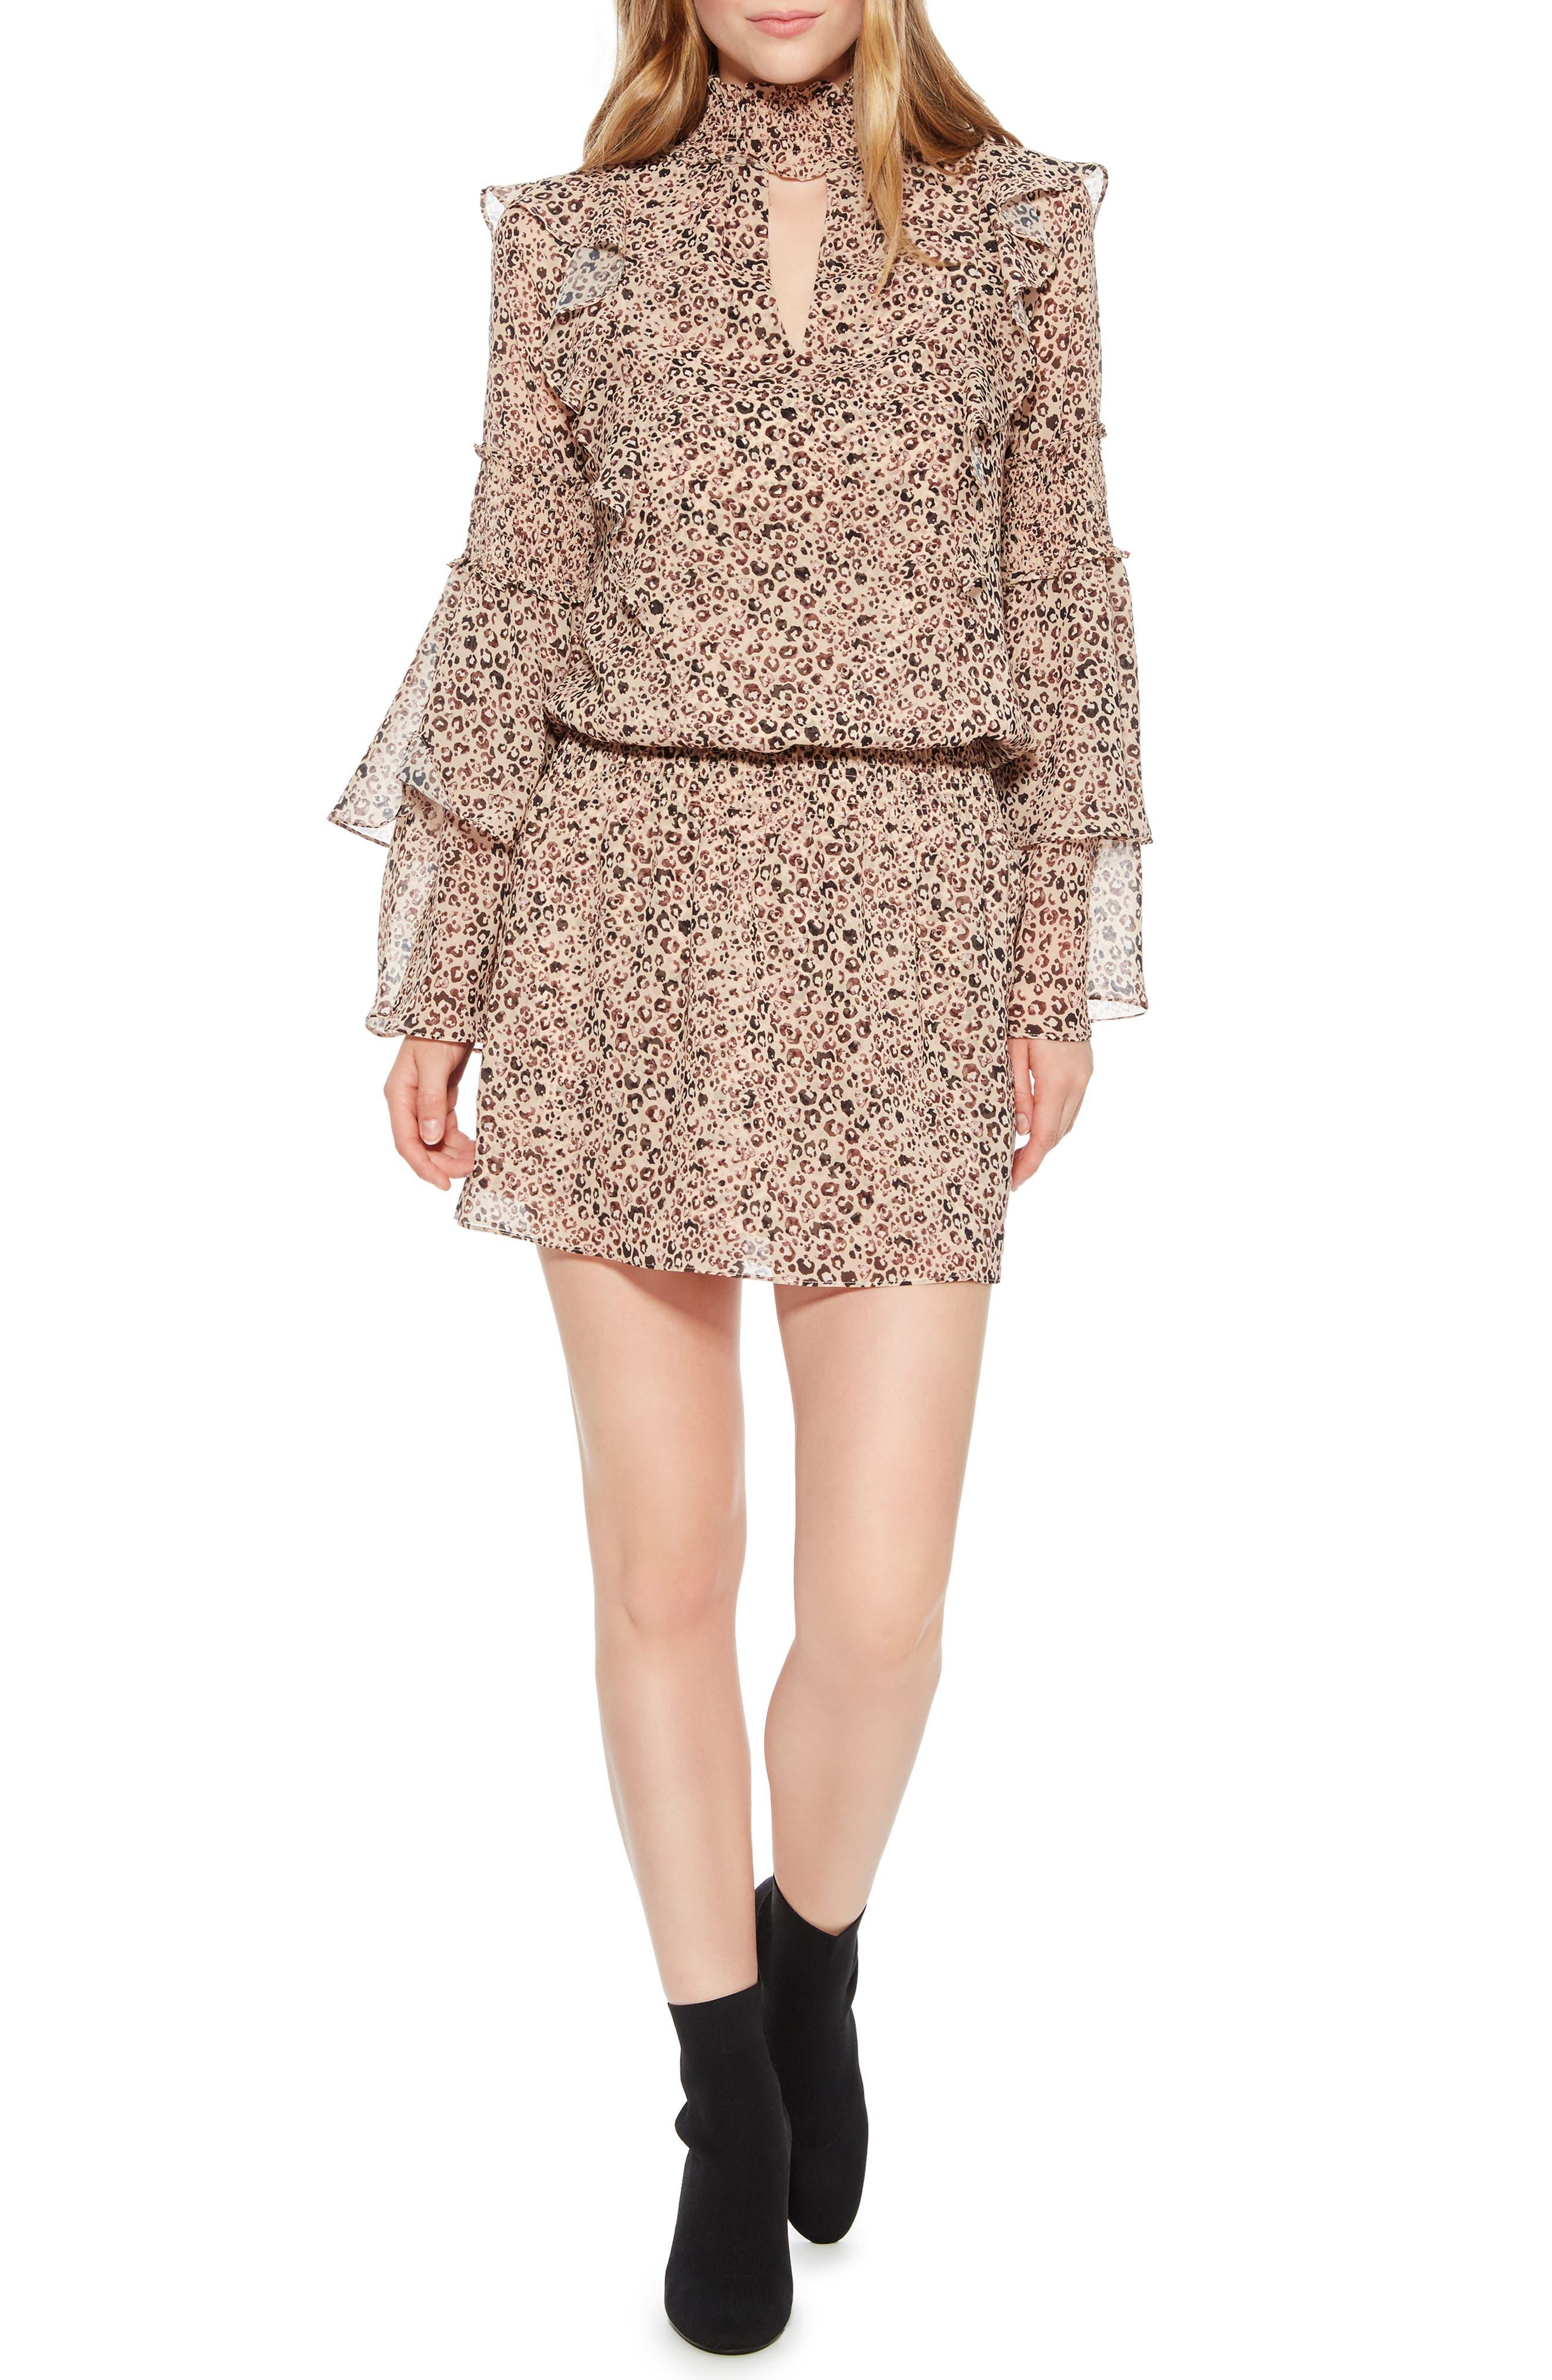 Elliana Smocked Minidress,                         Main,                         color, MINI CAMEL JUNGLE